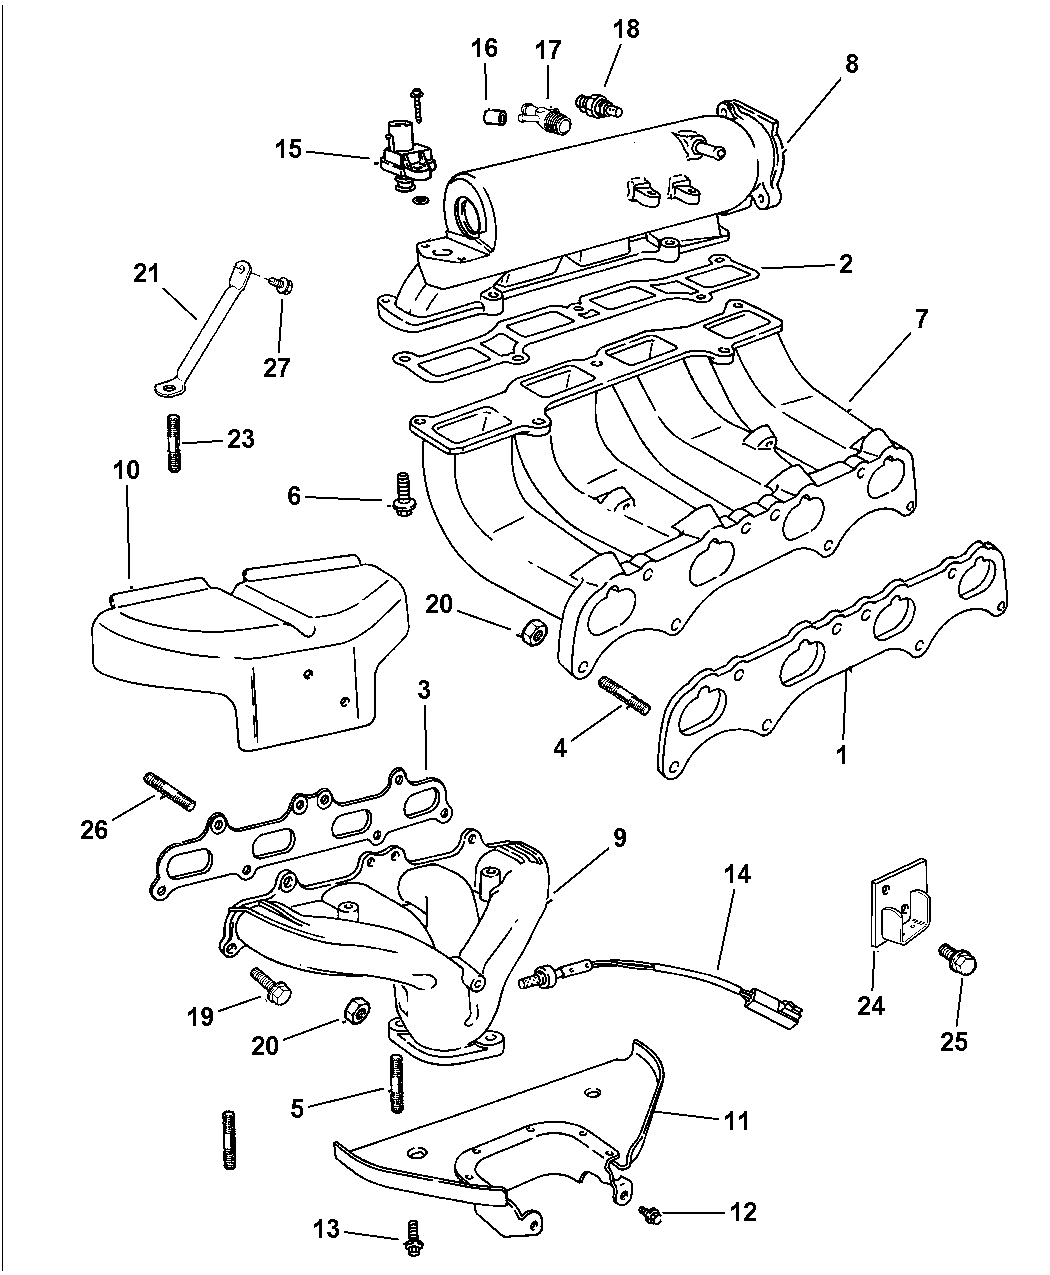 1997 Dodge Avenger Manifolds - Intake & Exhaust - Thumbnail 2